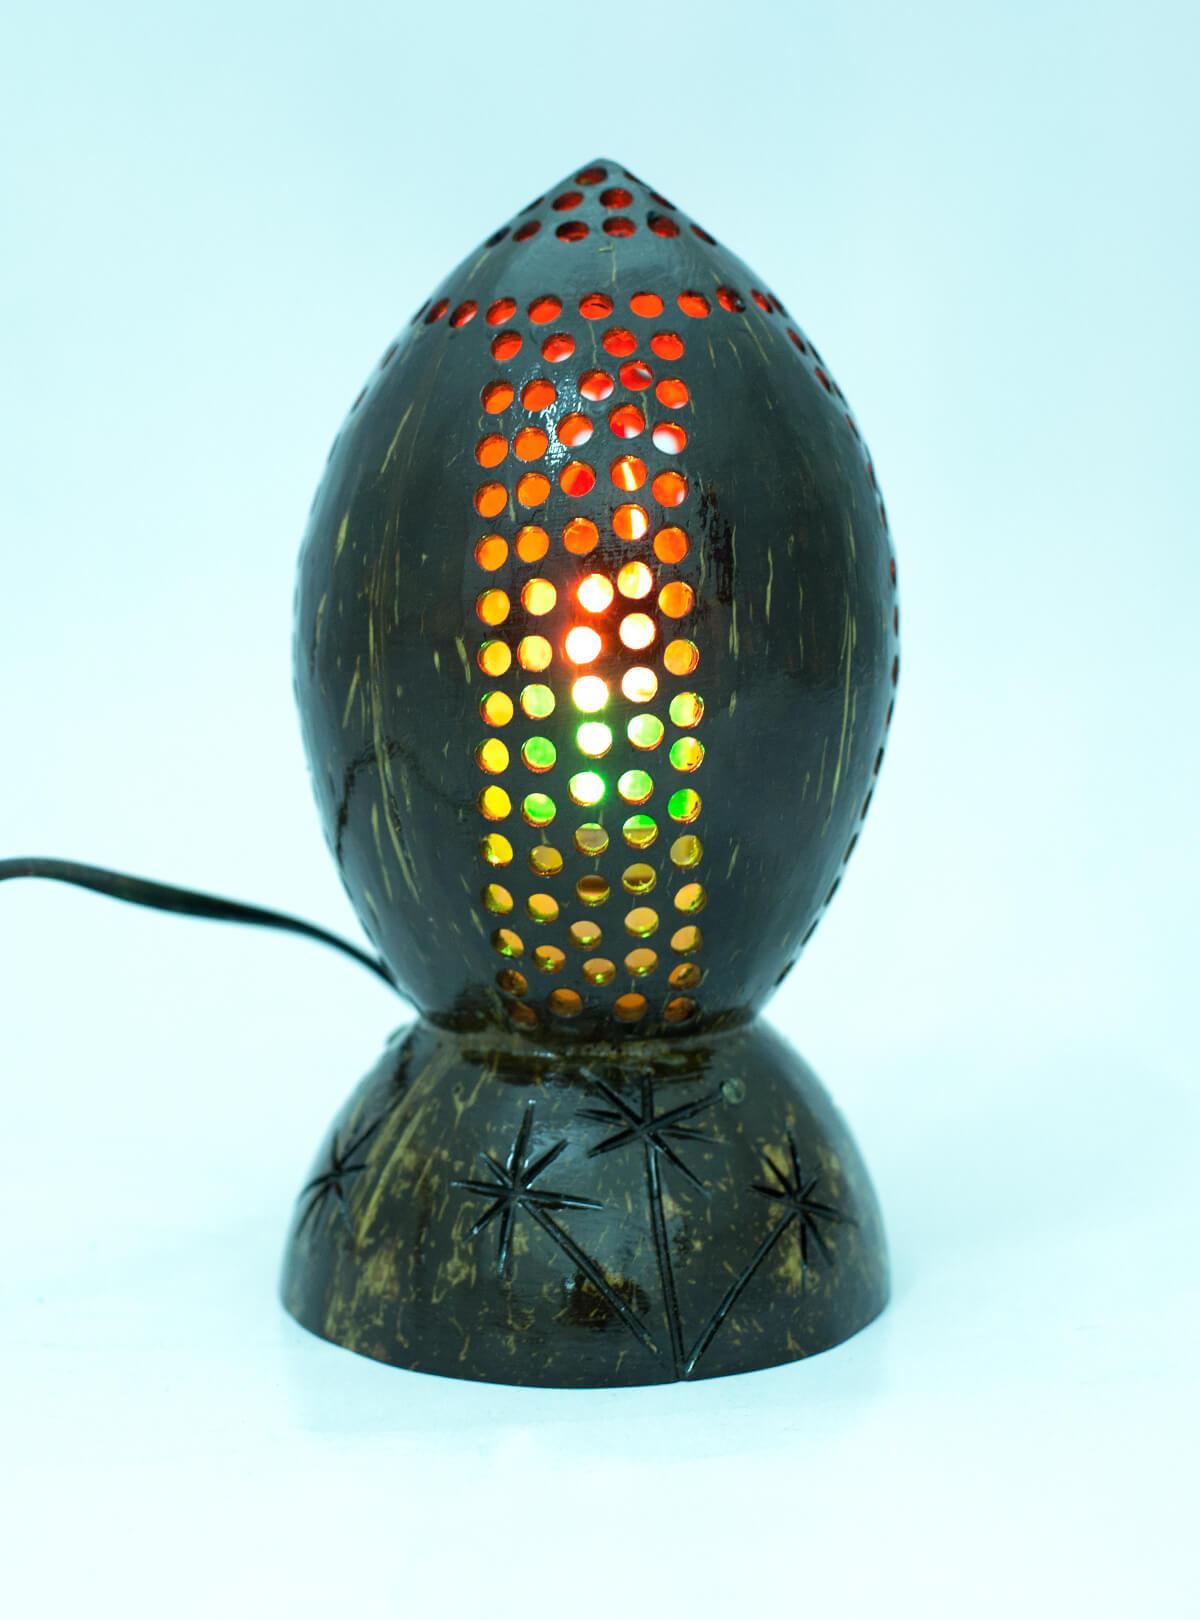 Eco-Friendly & Decorative Handmade Natural Coconut Shell Lamp